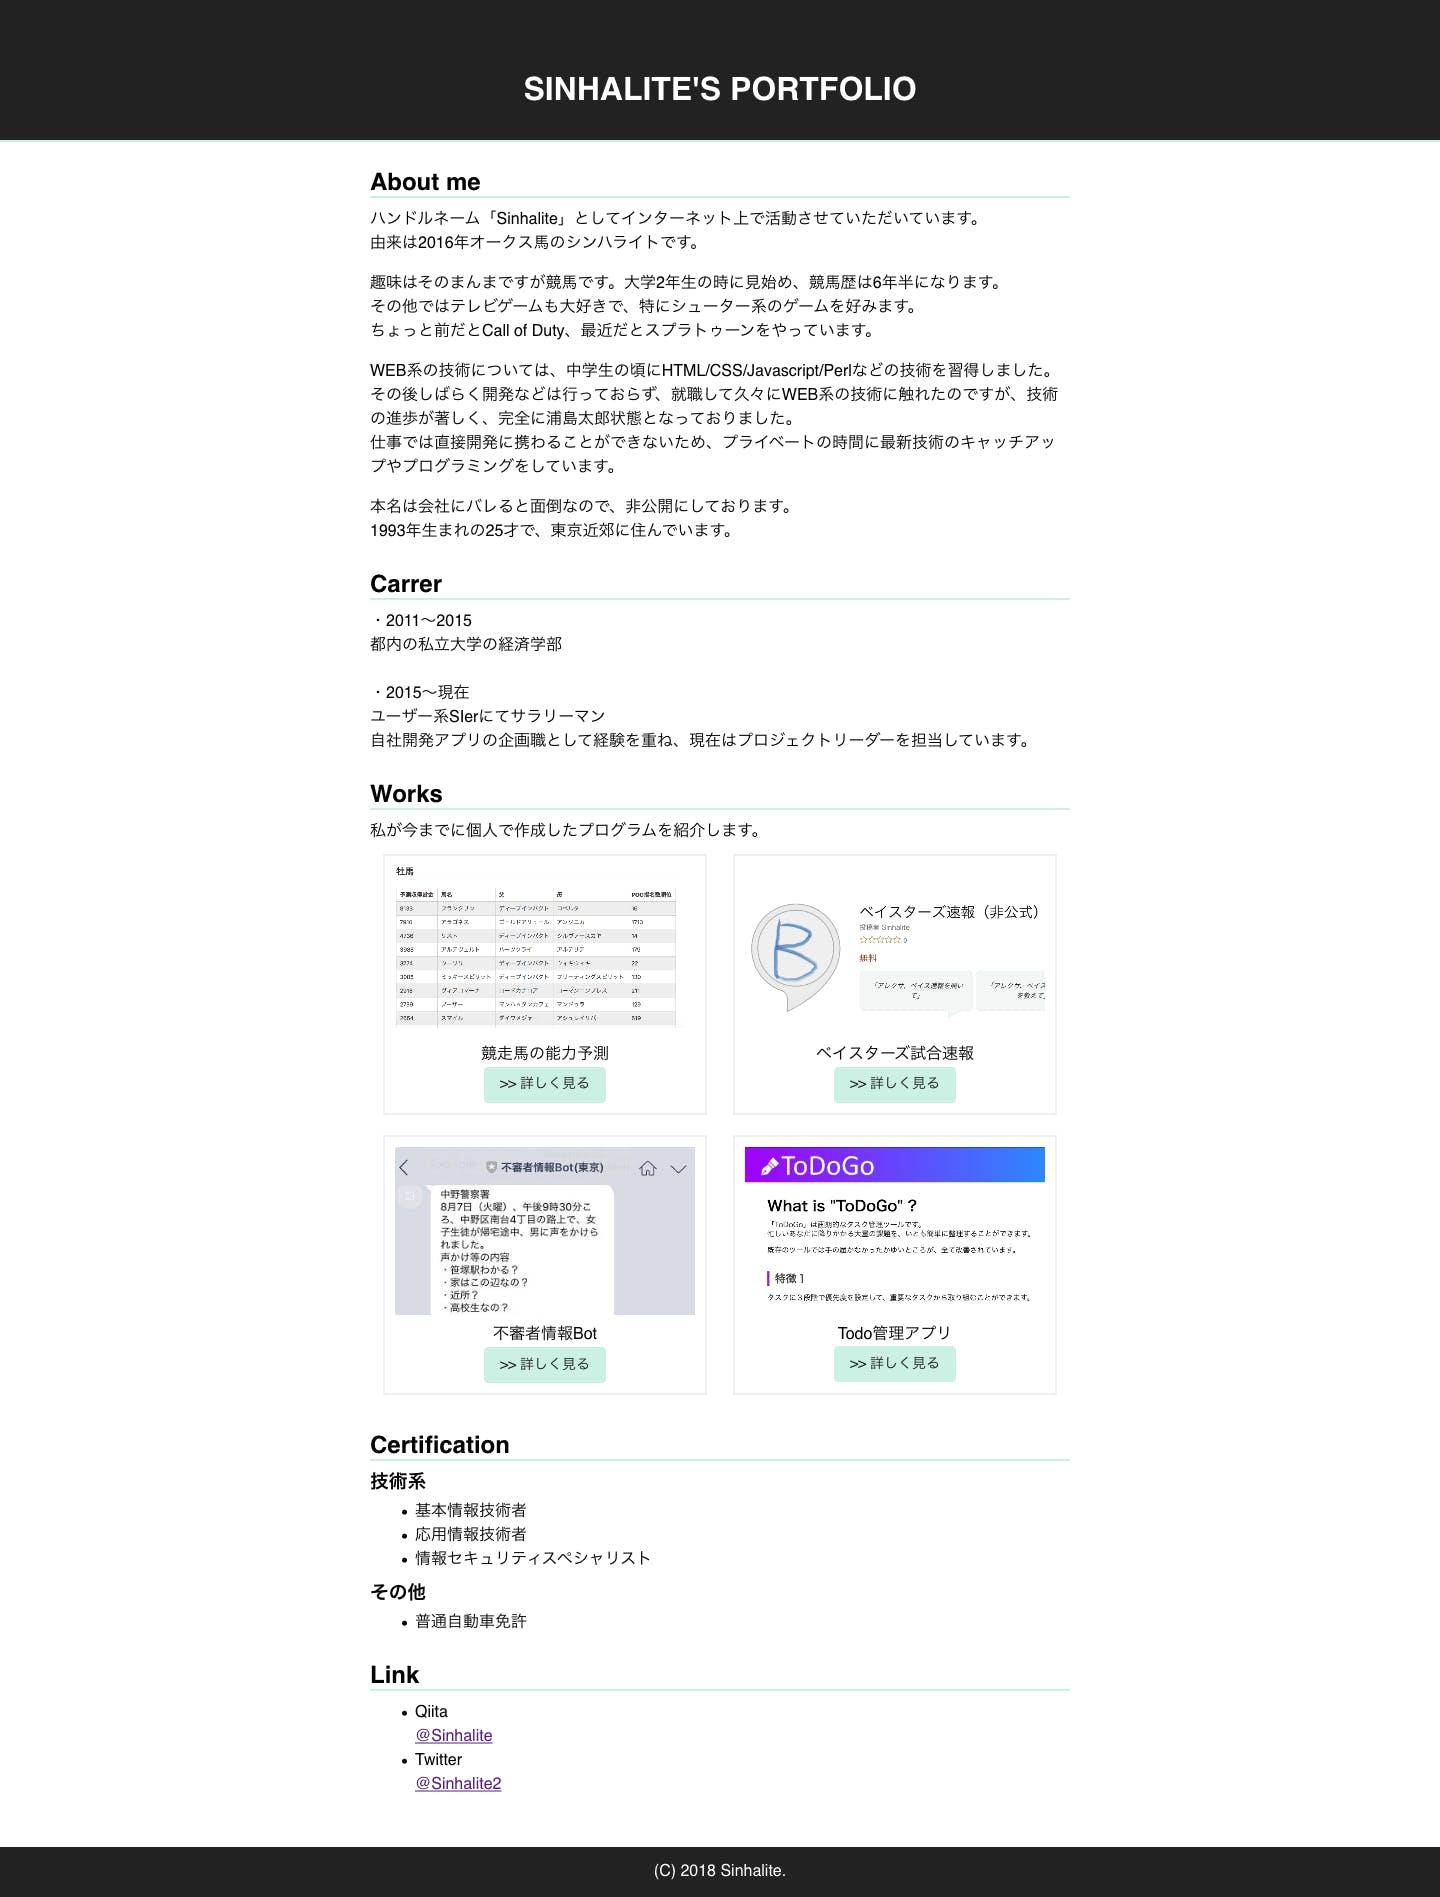 Screenshot_2018-09-30 SINHALITE'S PORTFOLIO.png